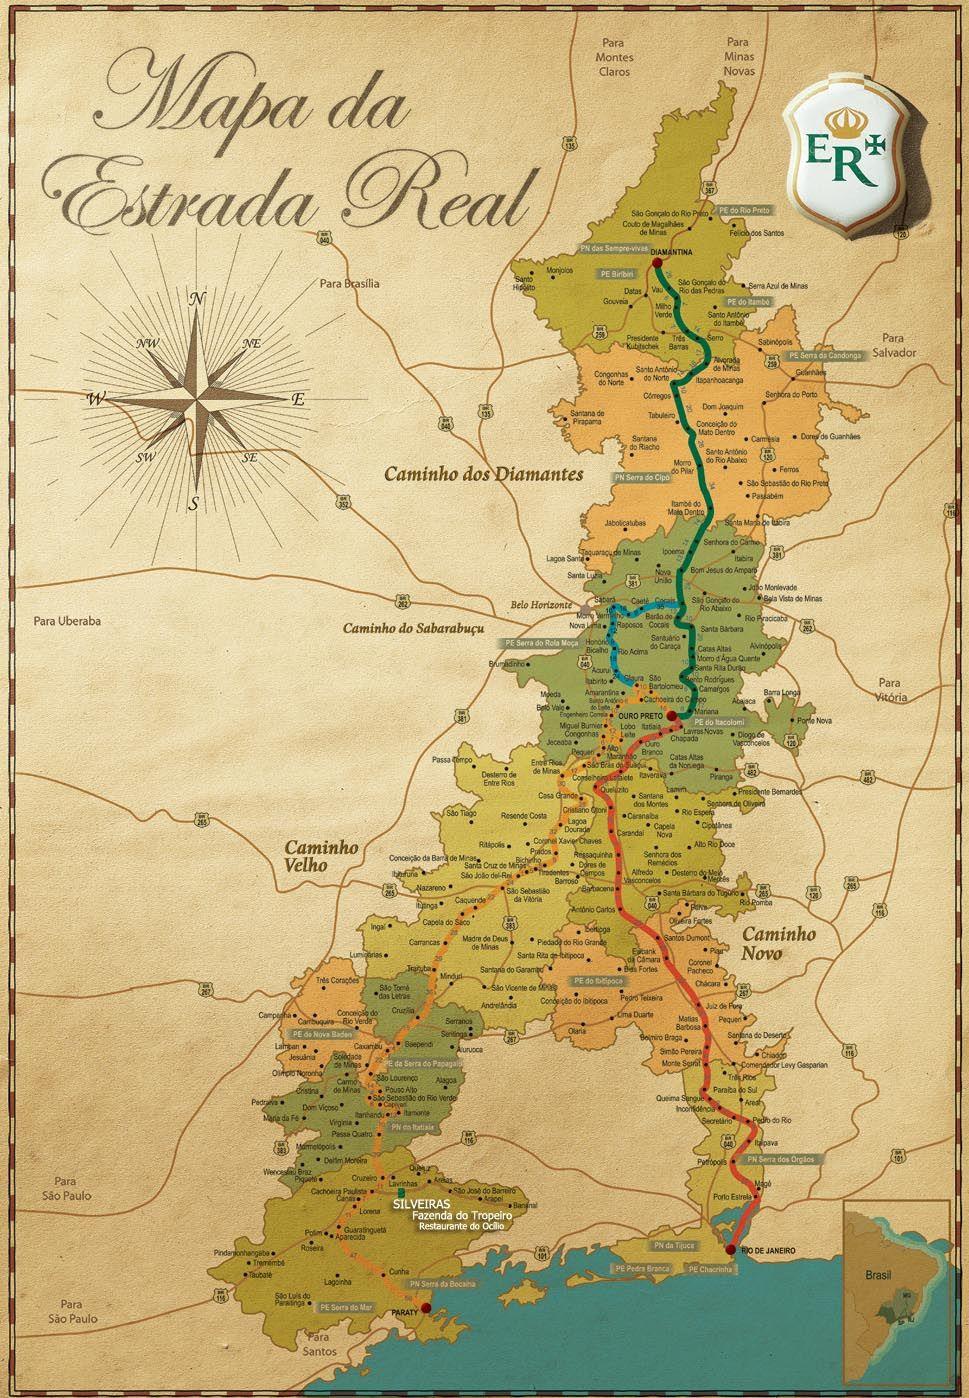 mapa da estrada Mapa da Estrada Real.   Old Maps in 2018   Pinterest   Map, Places  mapa da estrada